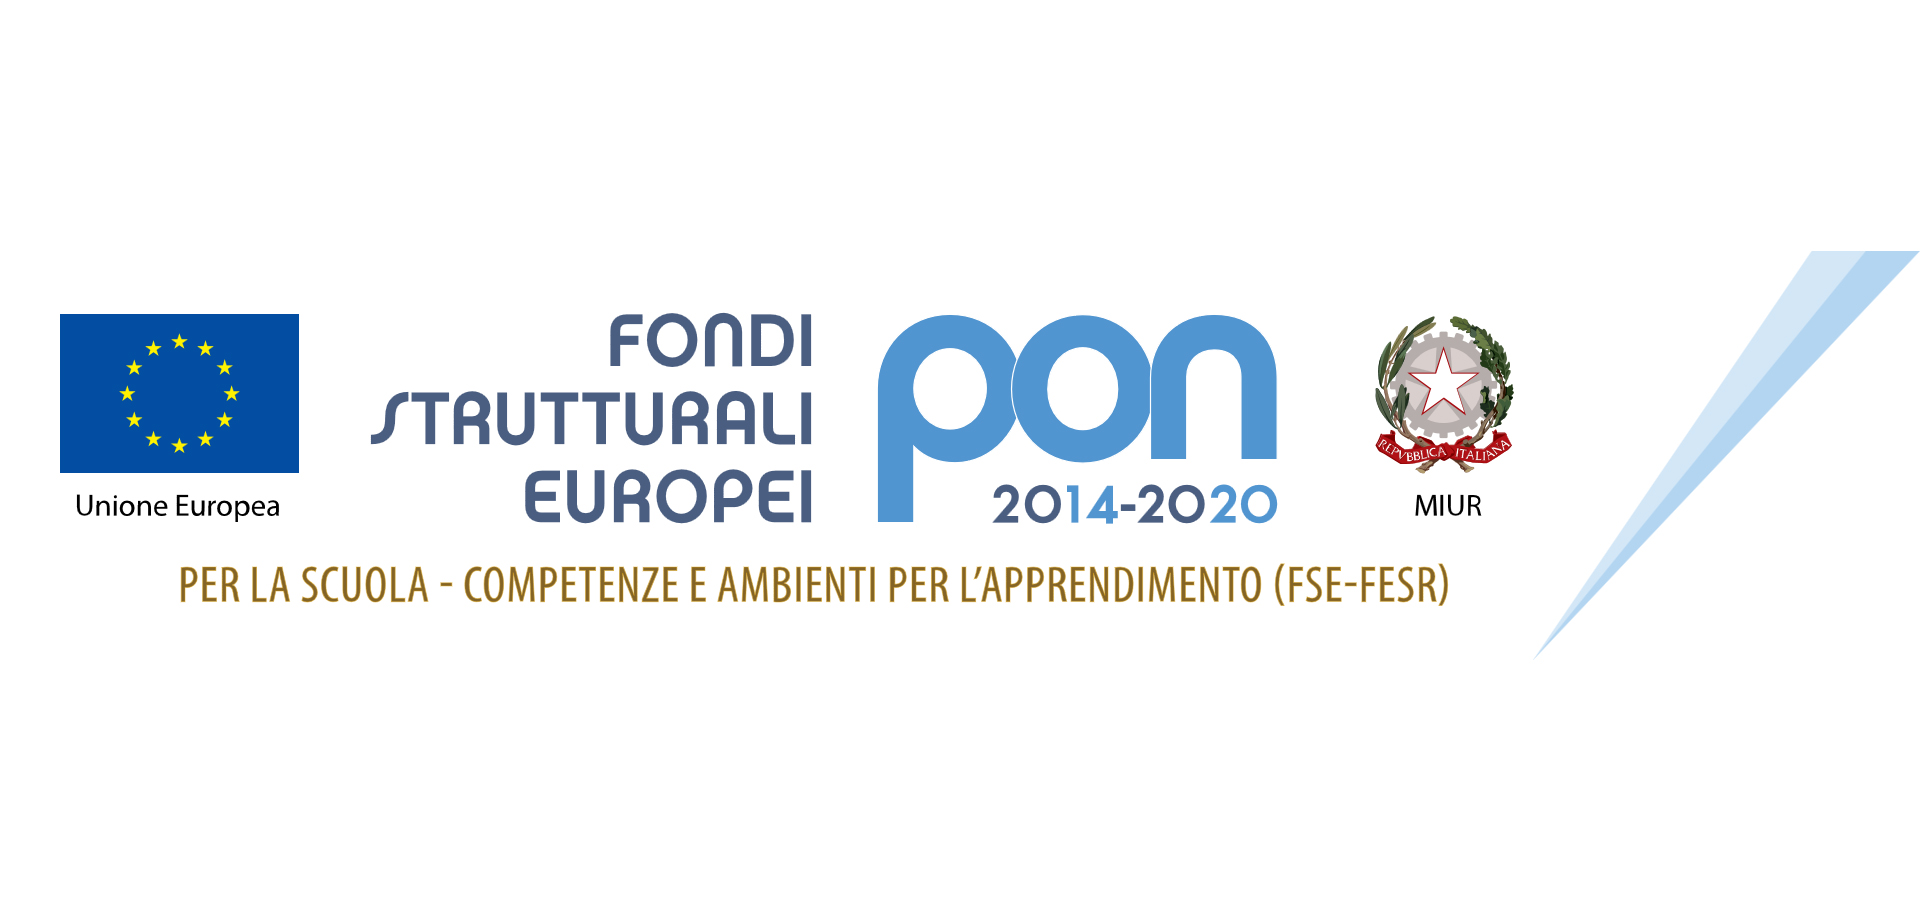 Fondi Strutturali Europei - PON 2014 - 2020